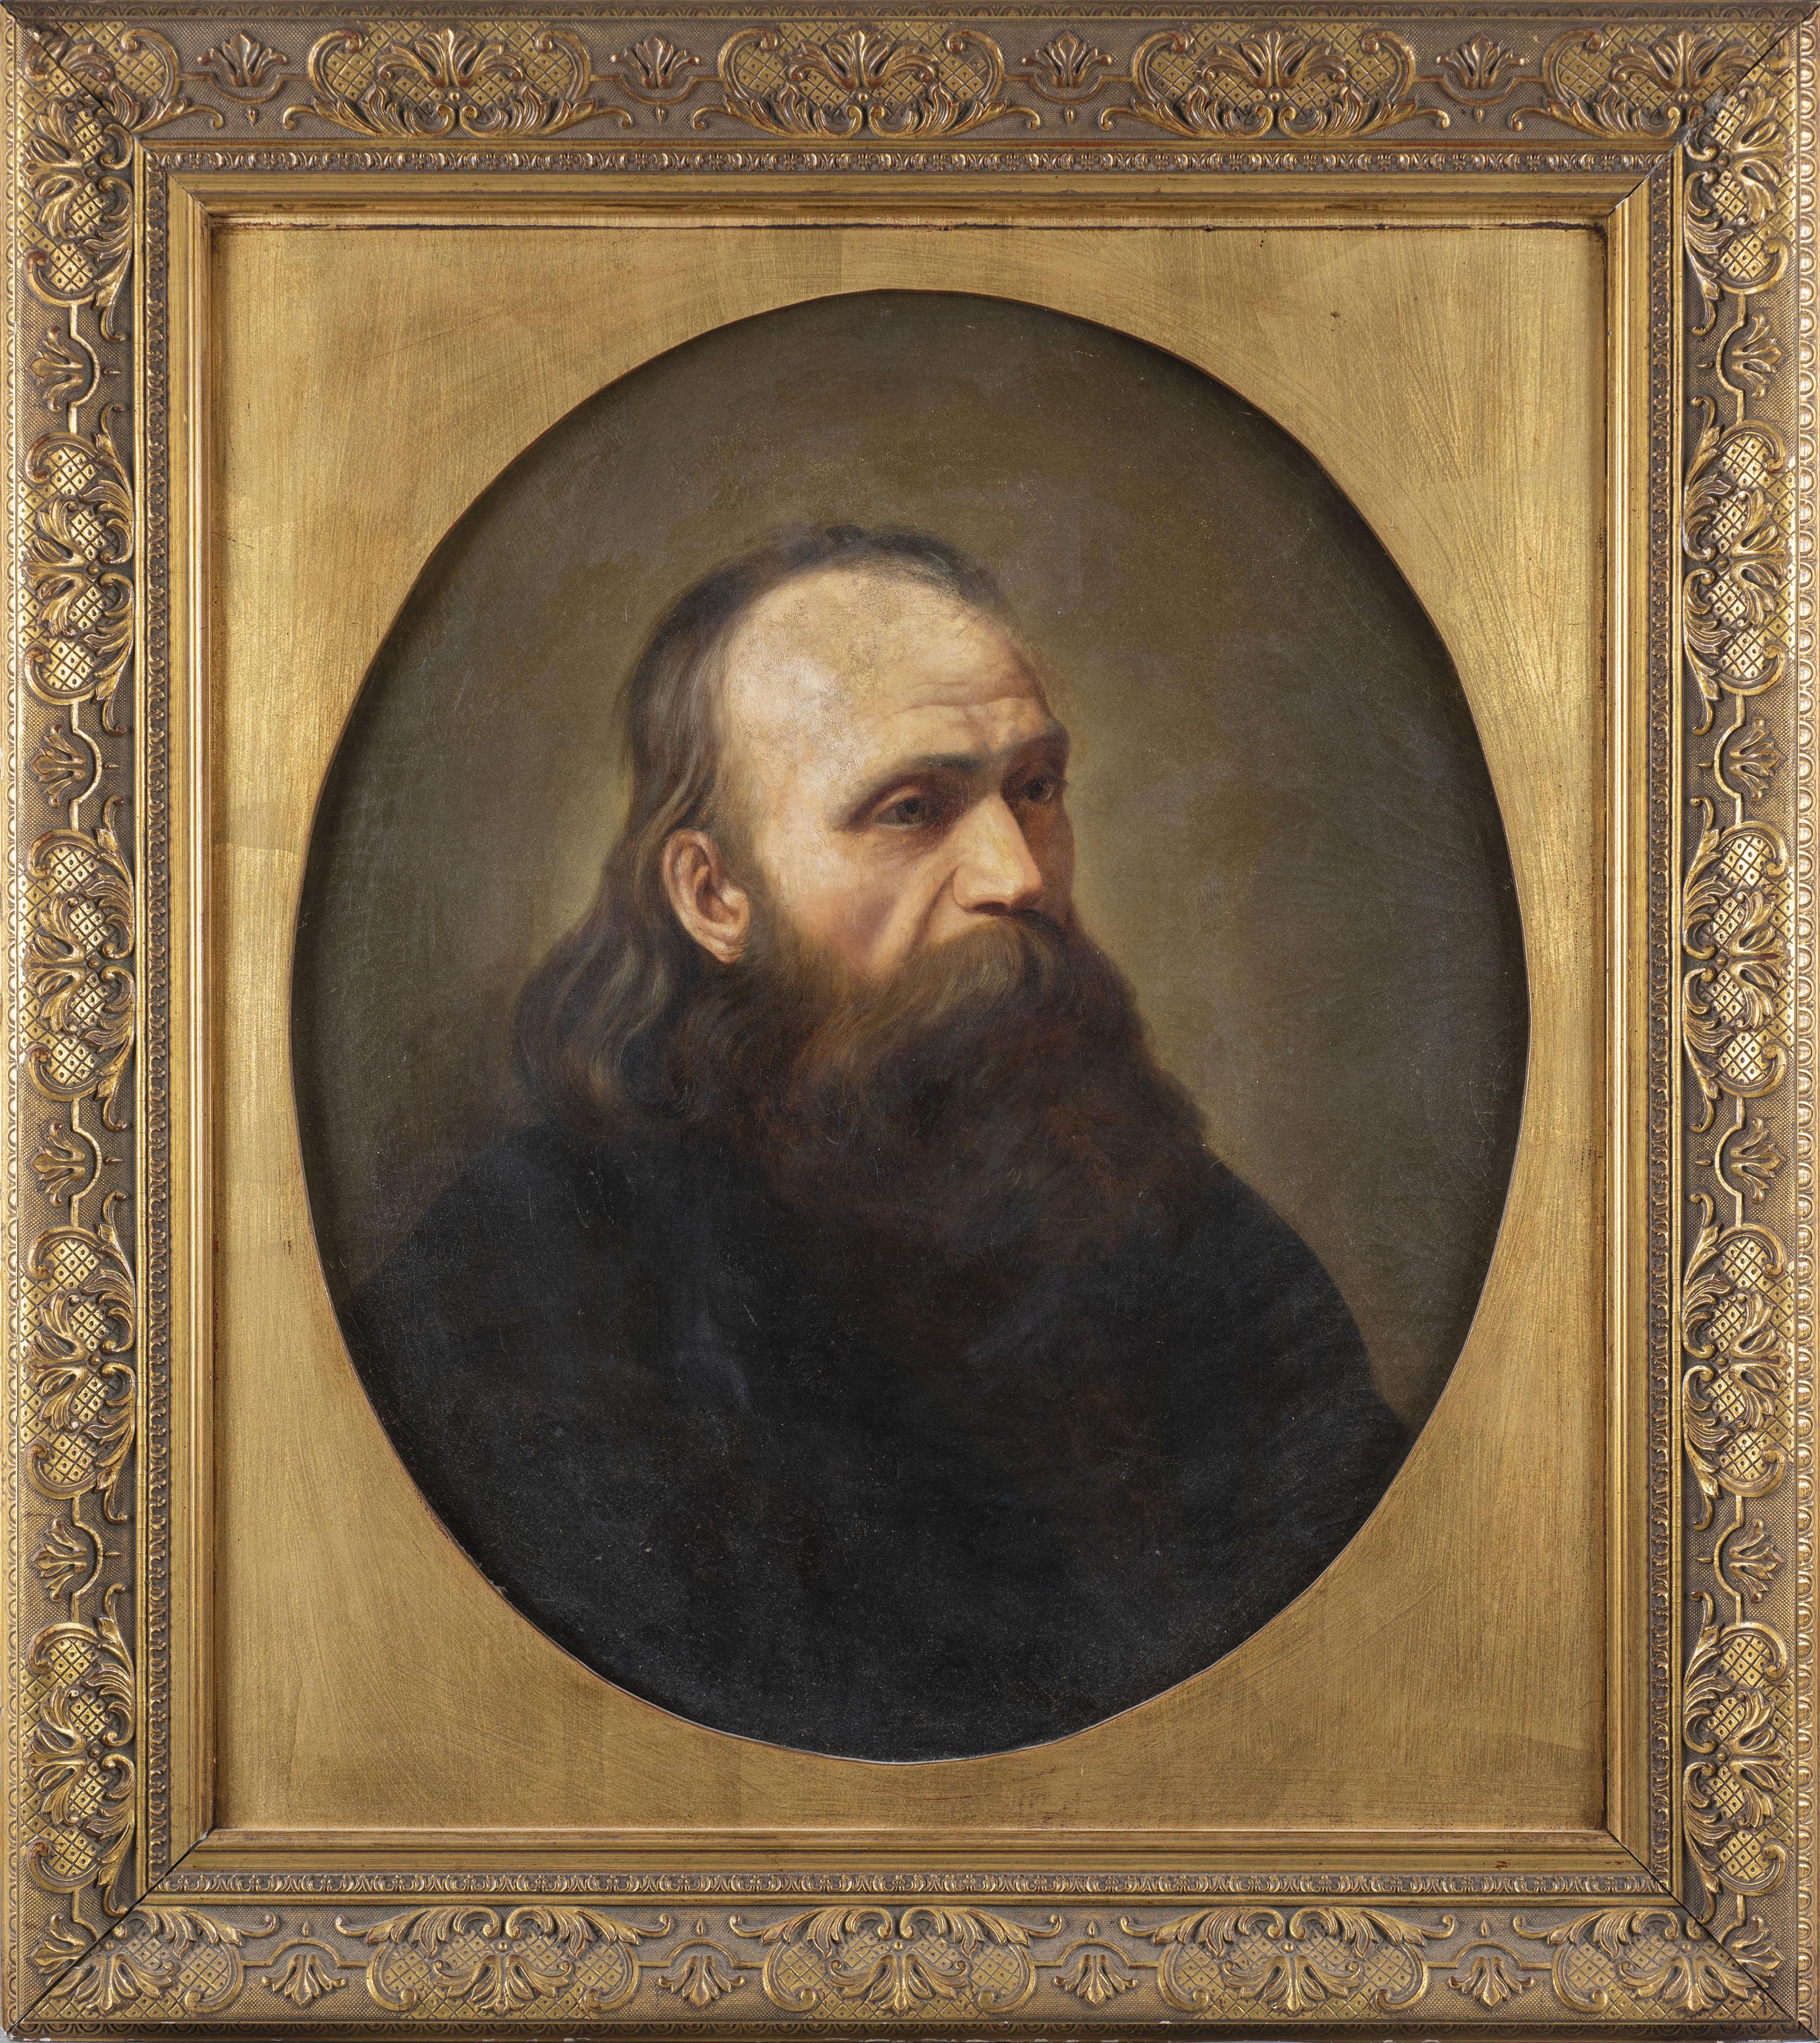 IVAN NIKOLAEVIC KRAMSKOJ (ATTR. A)